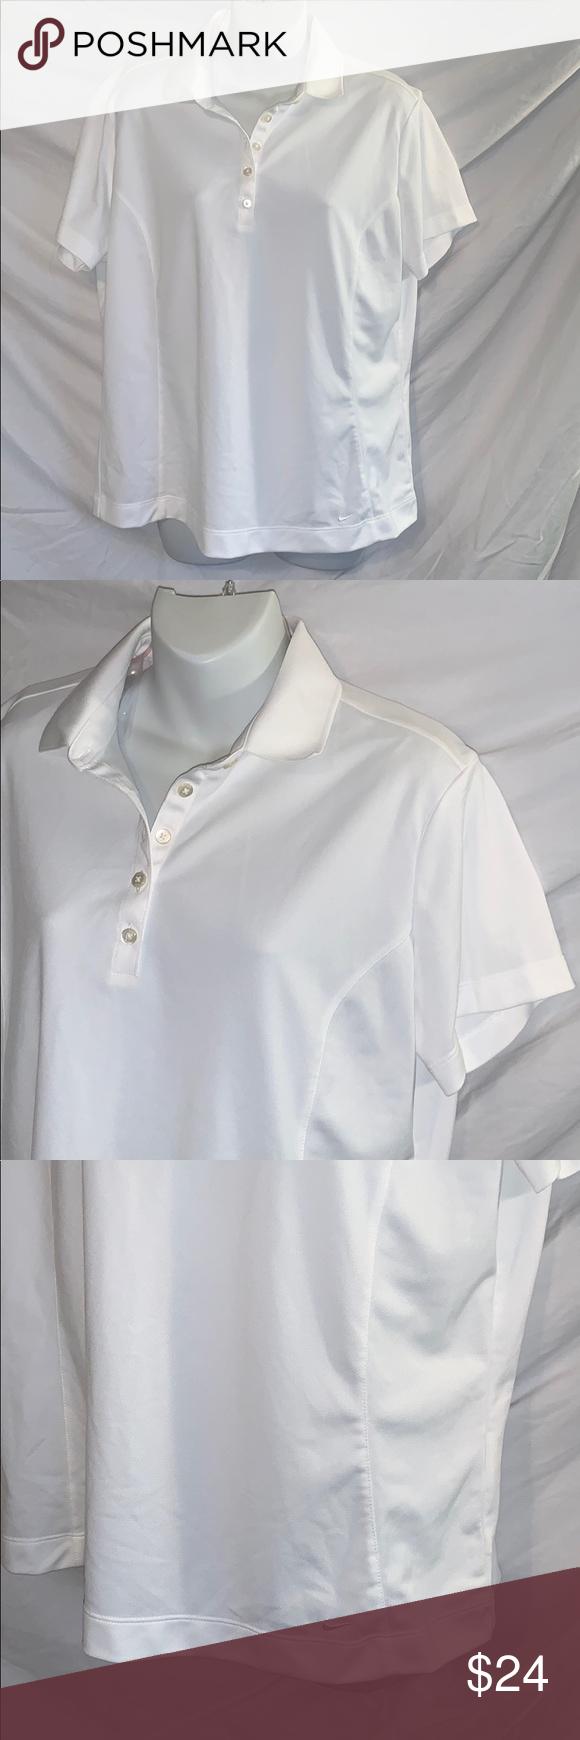 Nike Golf White Polo Shirt White Polo Shirt Nike Golf Shirts